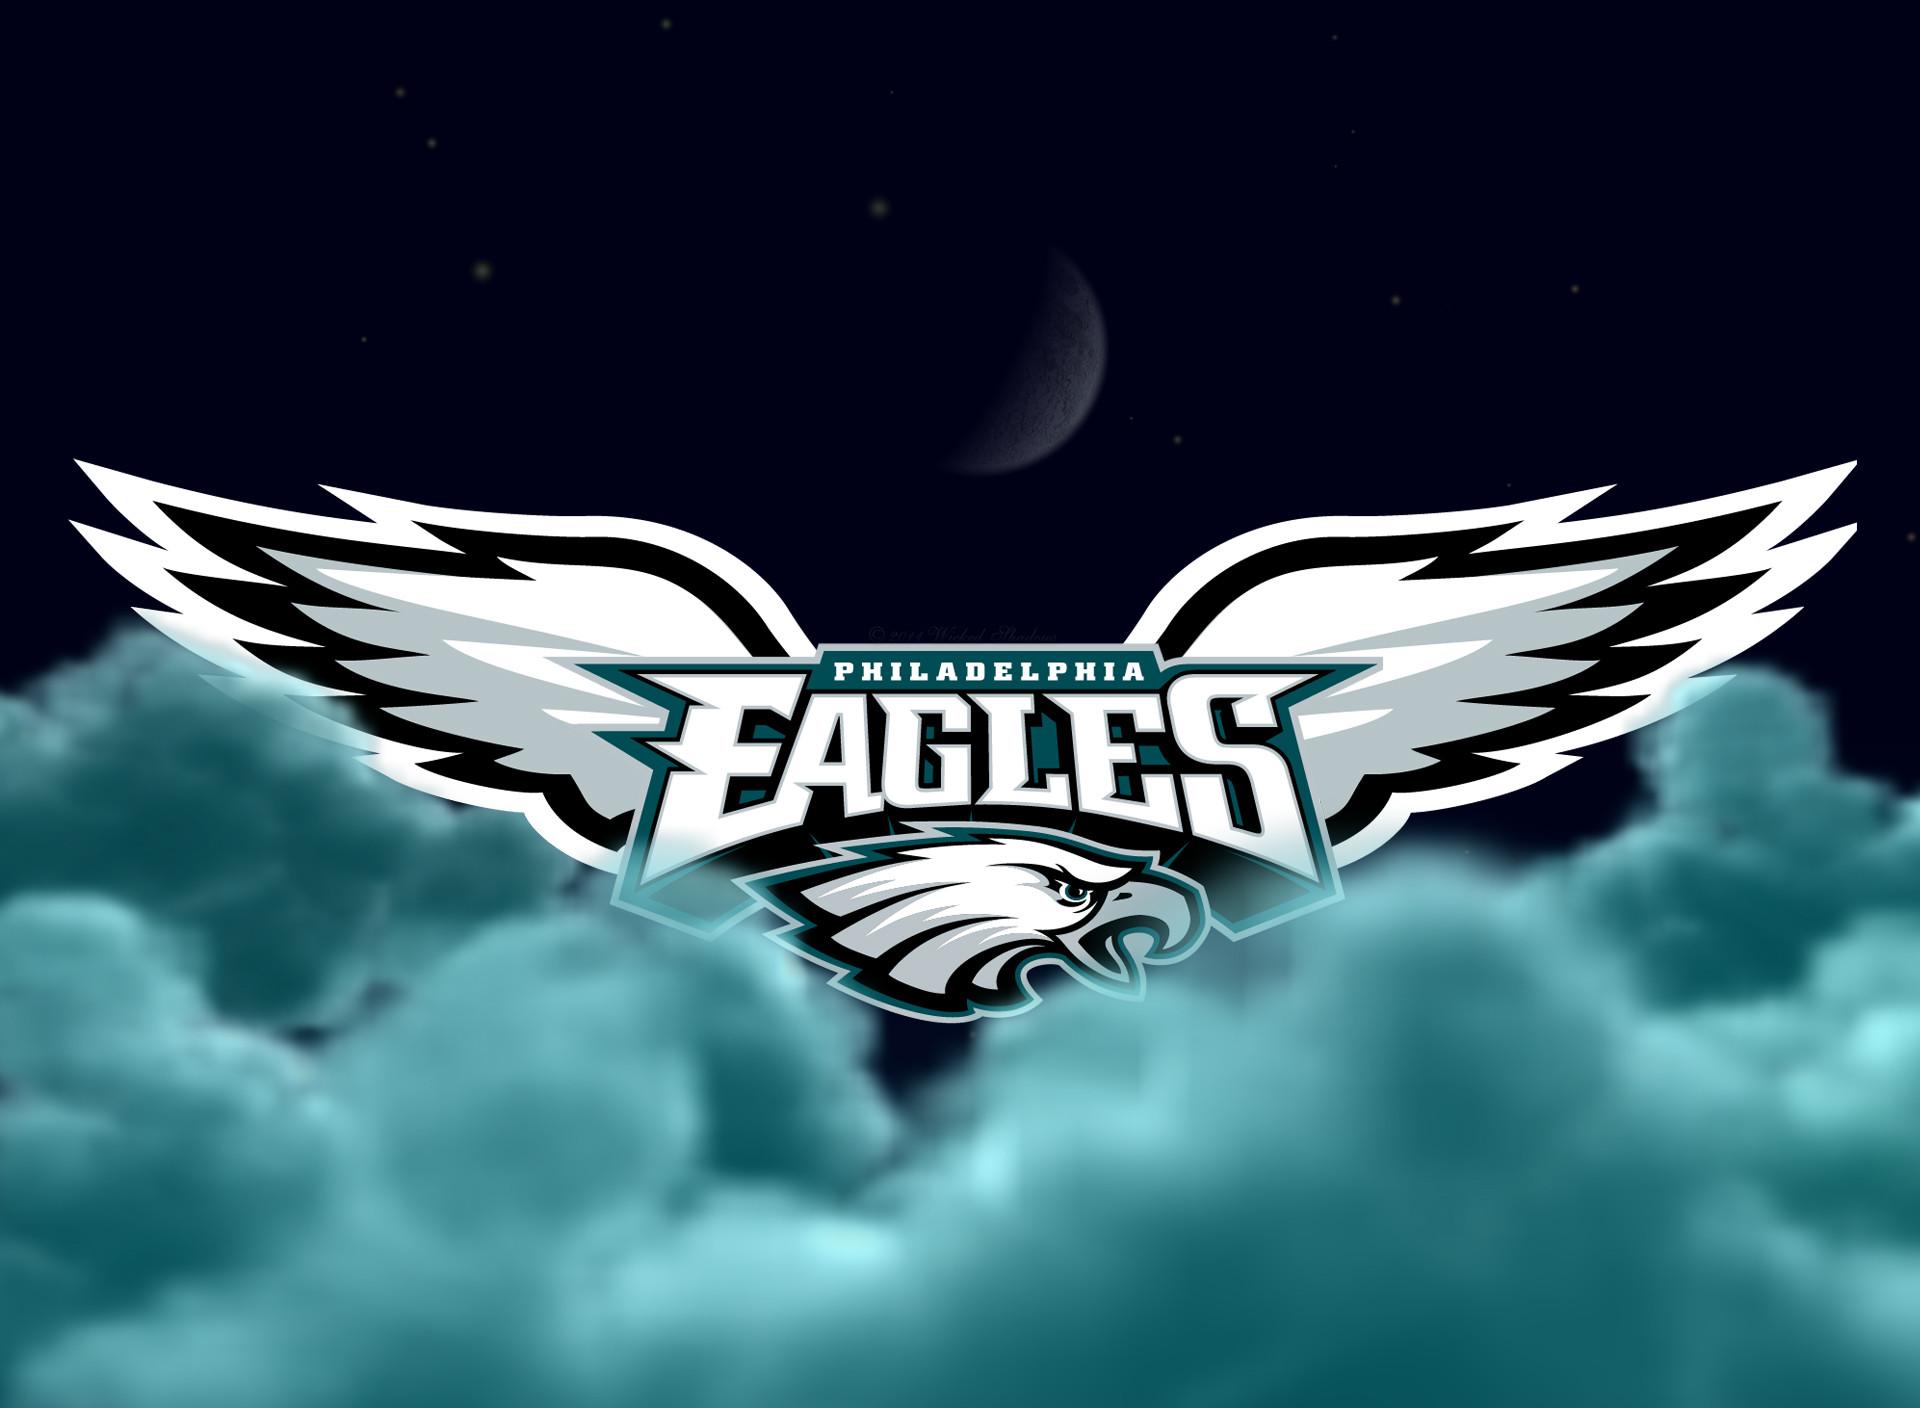 www.philadelphiaeagles.com   Philadelphia Eagles Desktop Theme Pictures